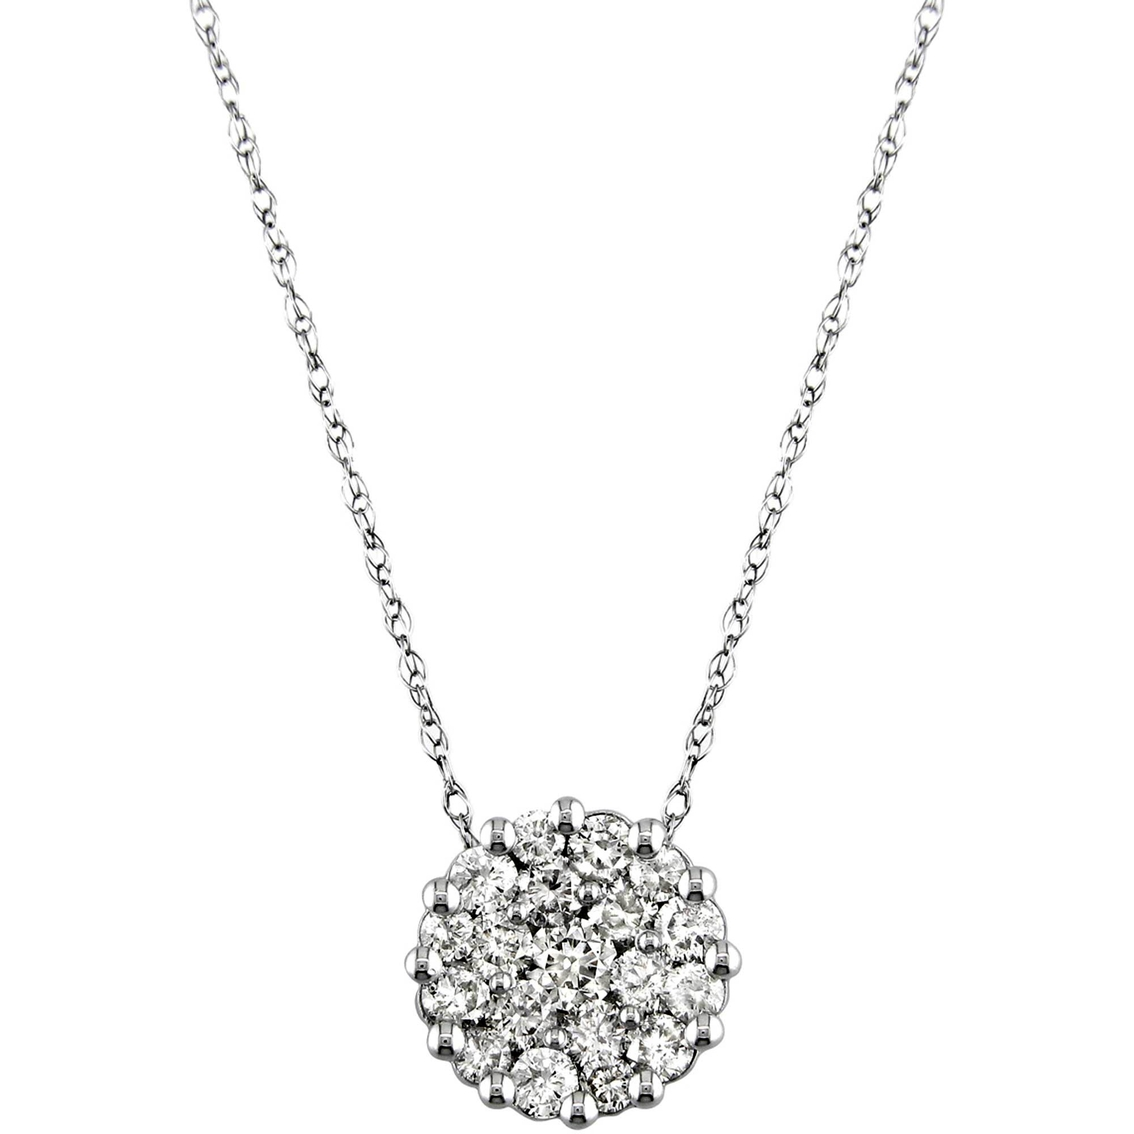 14k White Gold 1 Ctw Round Diamond Cluster Pendant